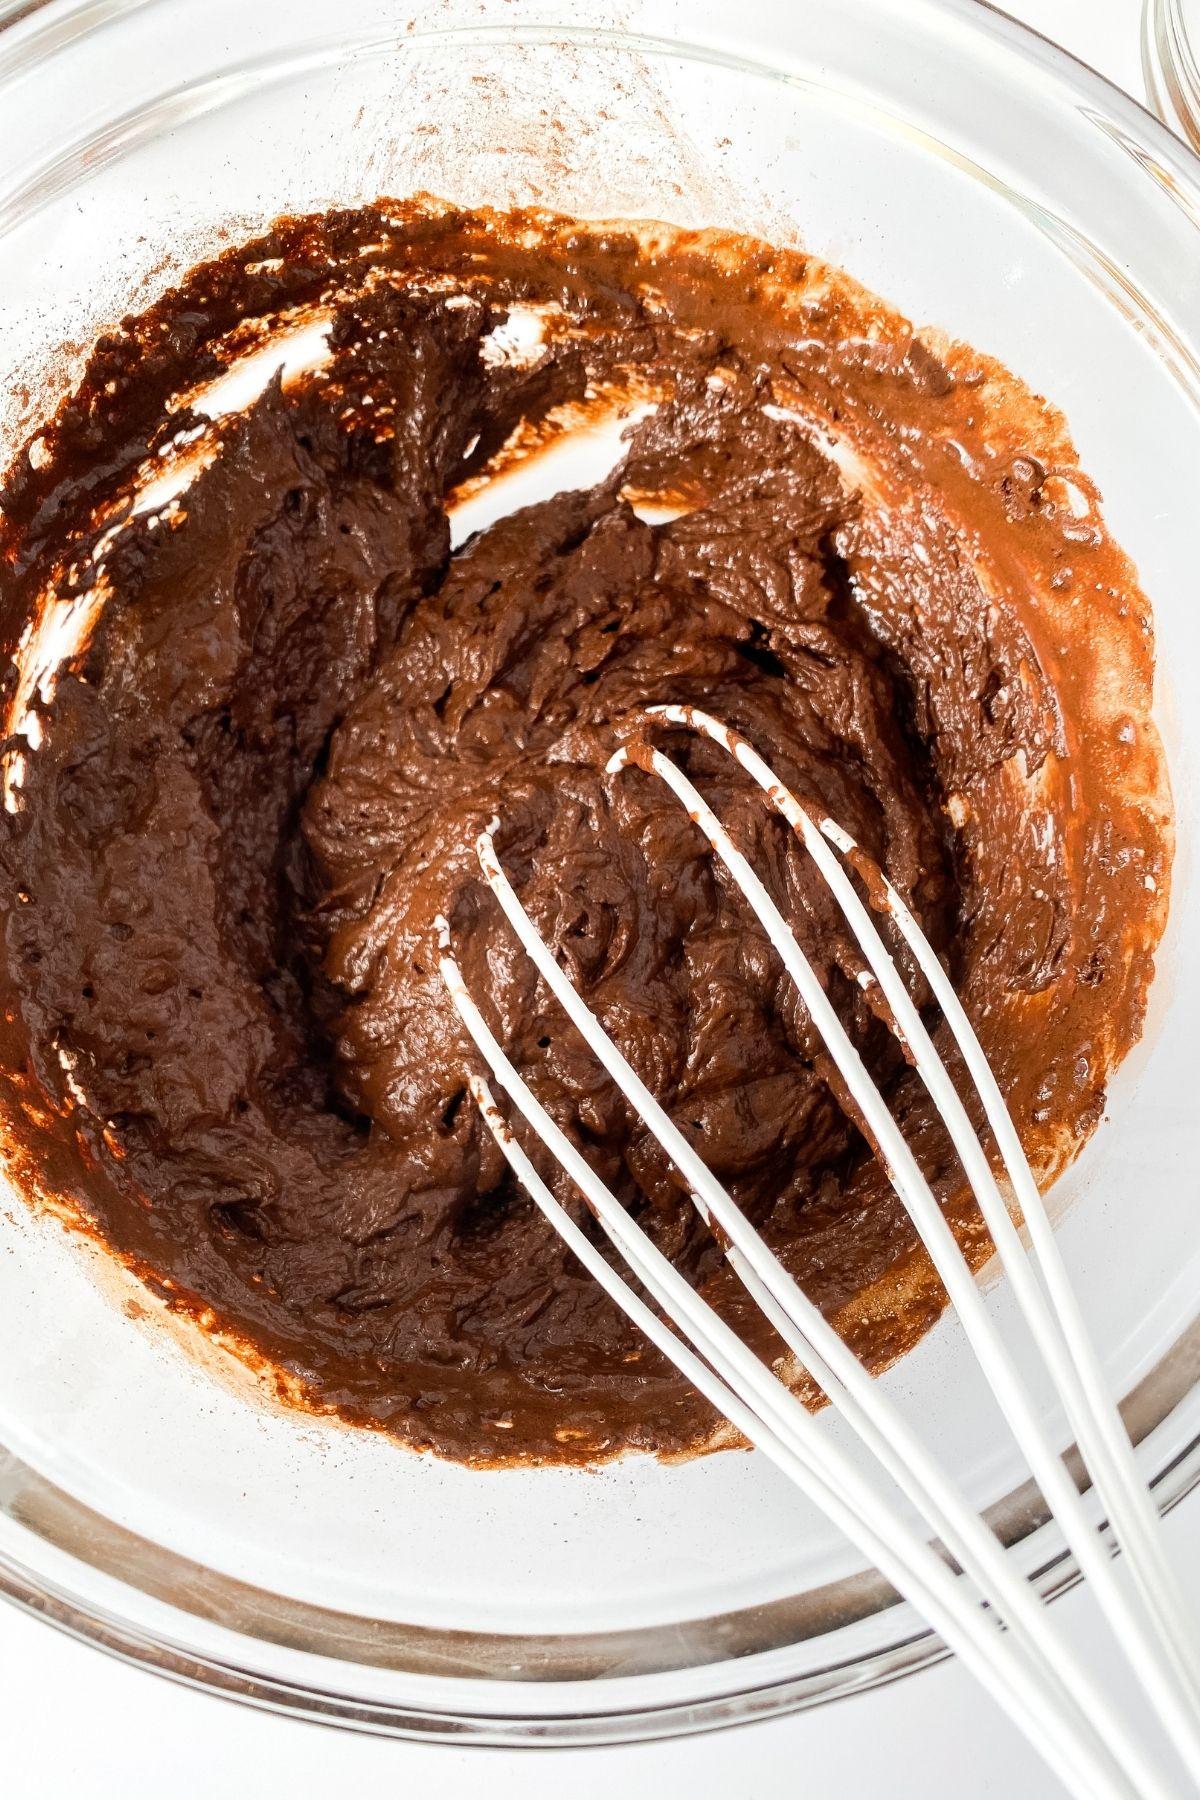 Brownie batter in bowl